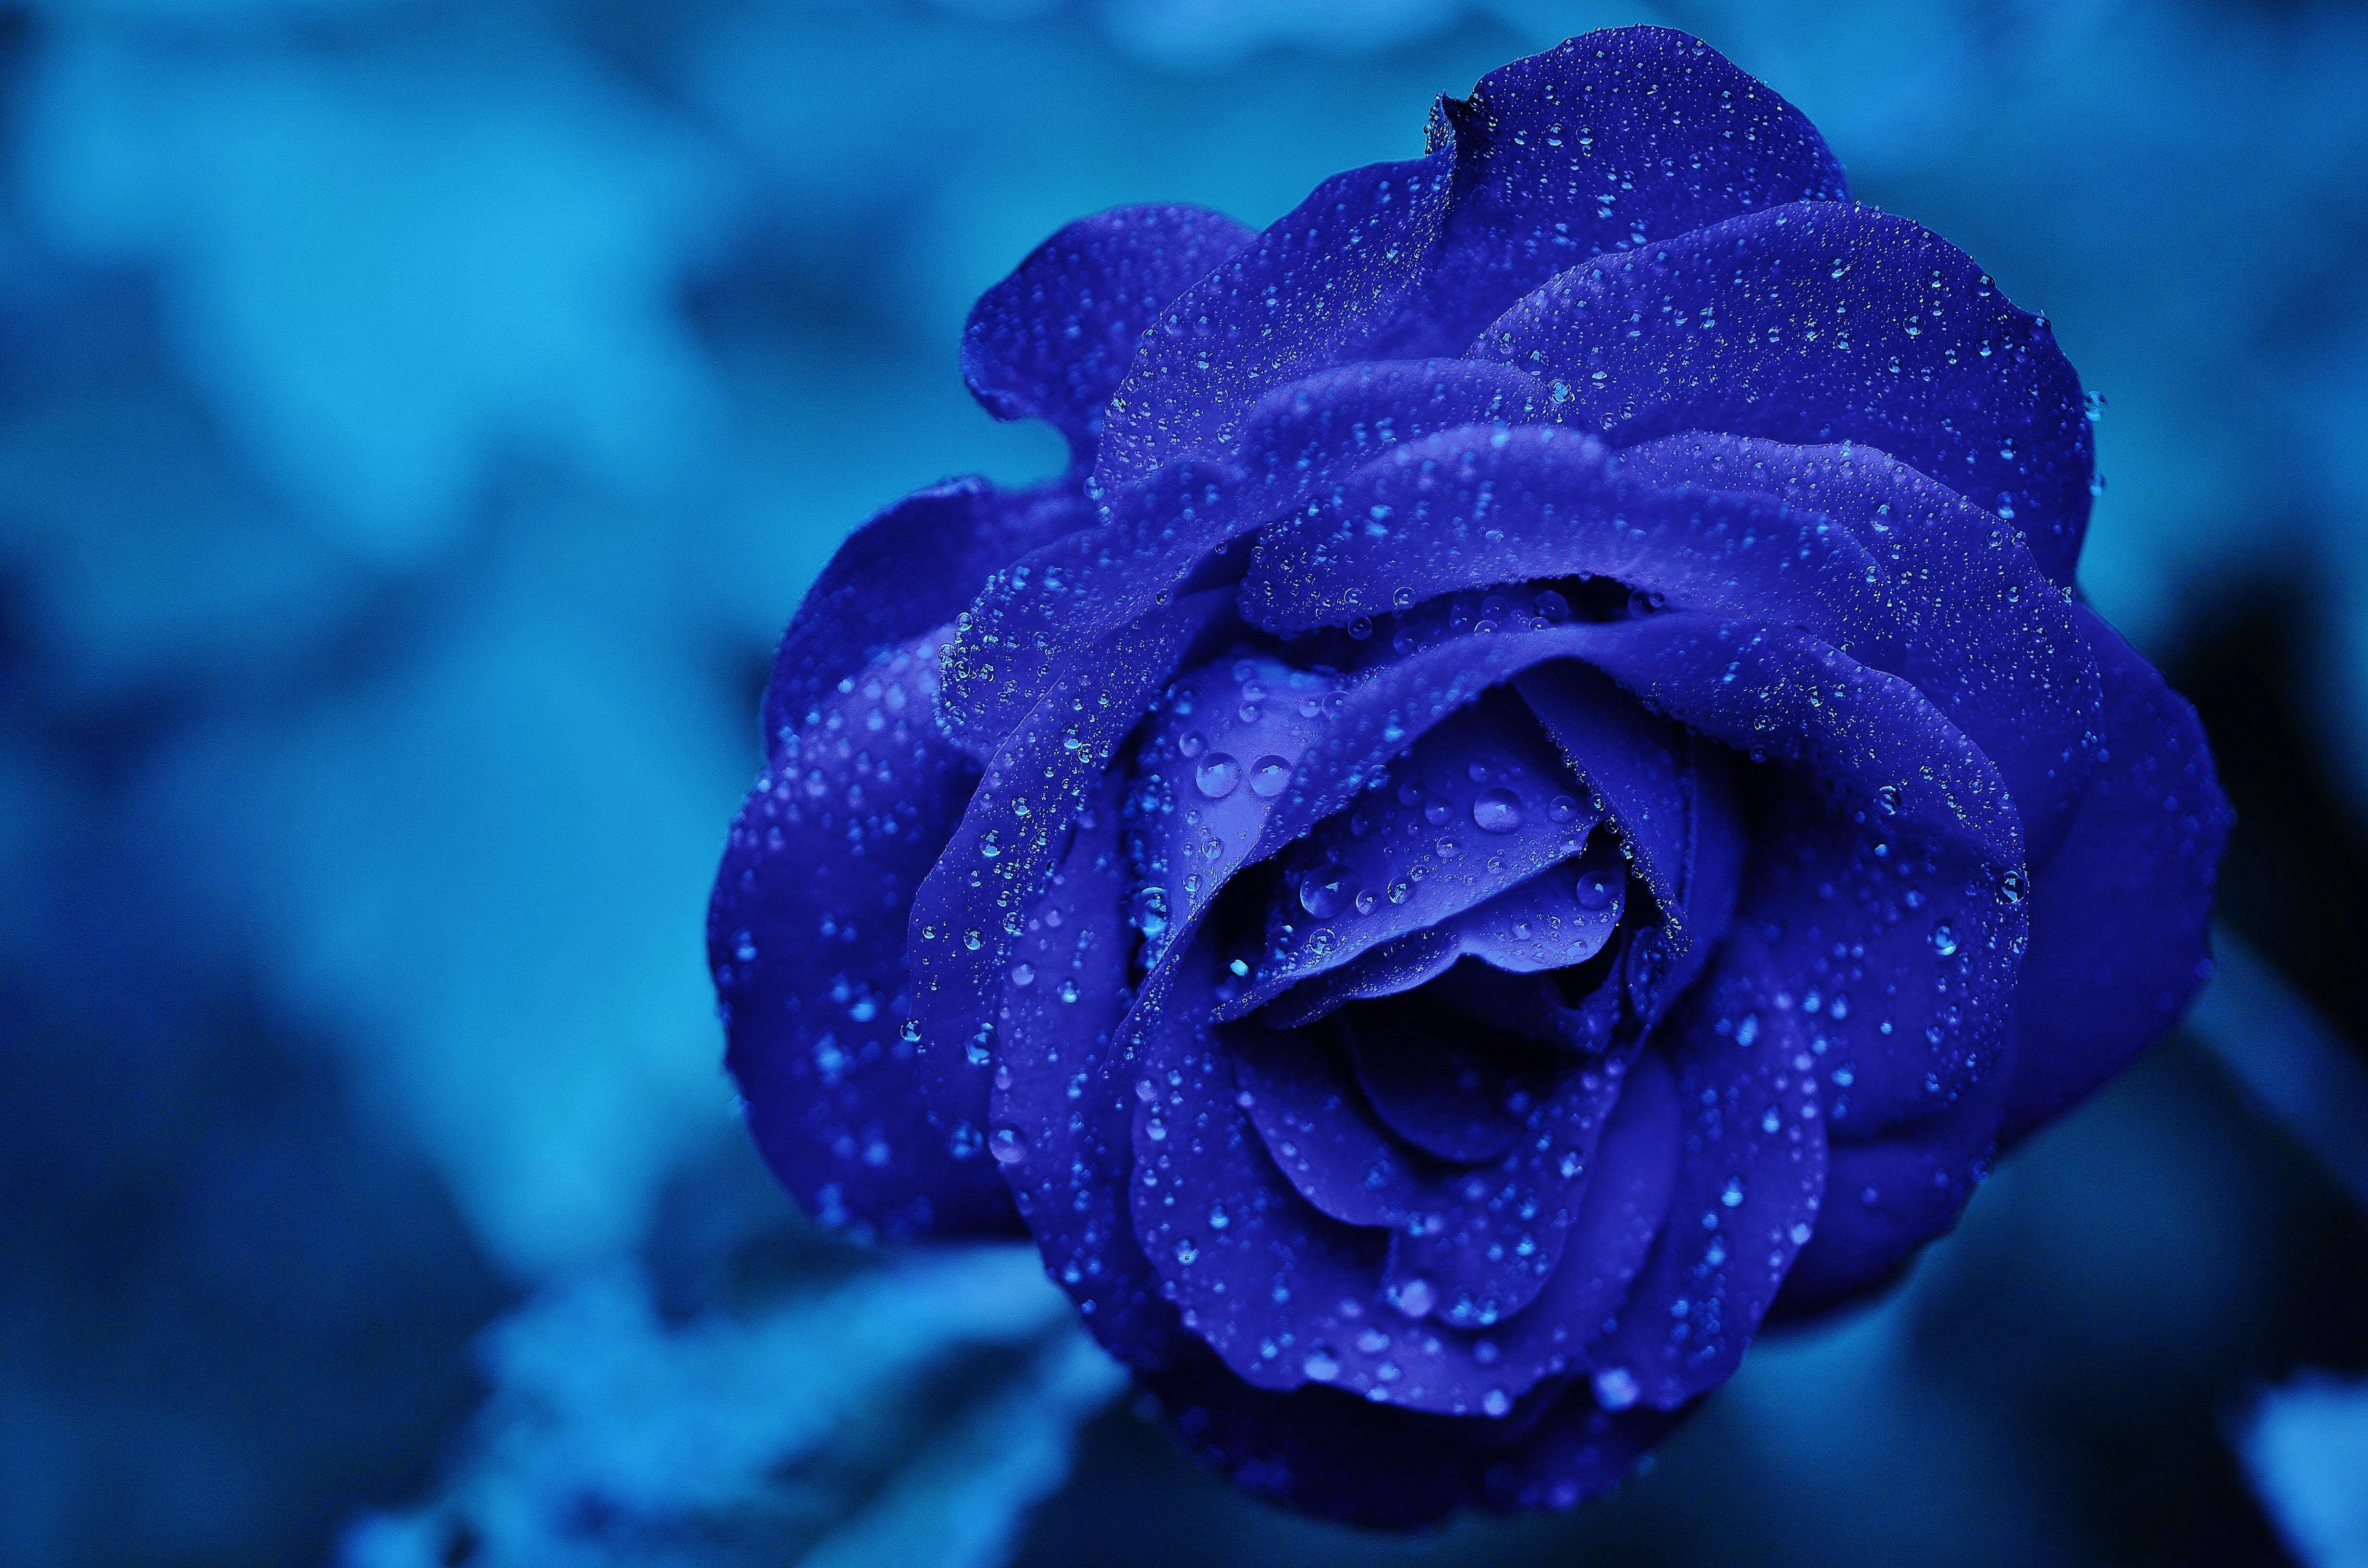 Blue flower 4k 5k hd flowers 4k wallpapers images backgrounds blue flower 4k 5k izmirmasajfo